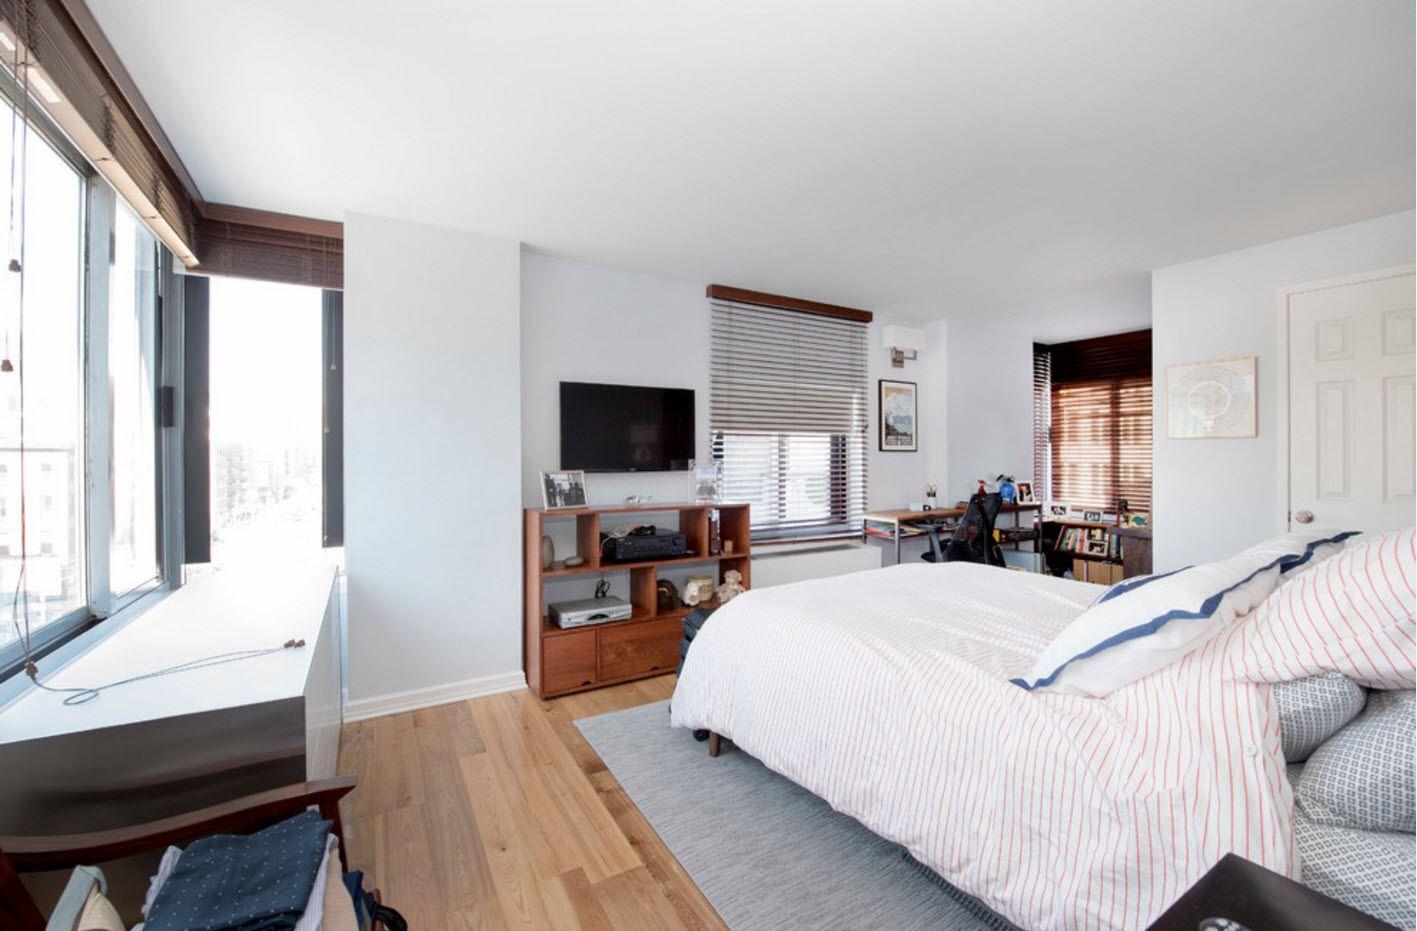 Apartment Interior Design Inspiration Ideas & Trends 2017. Modern functional bedroom